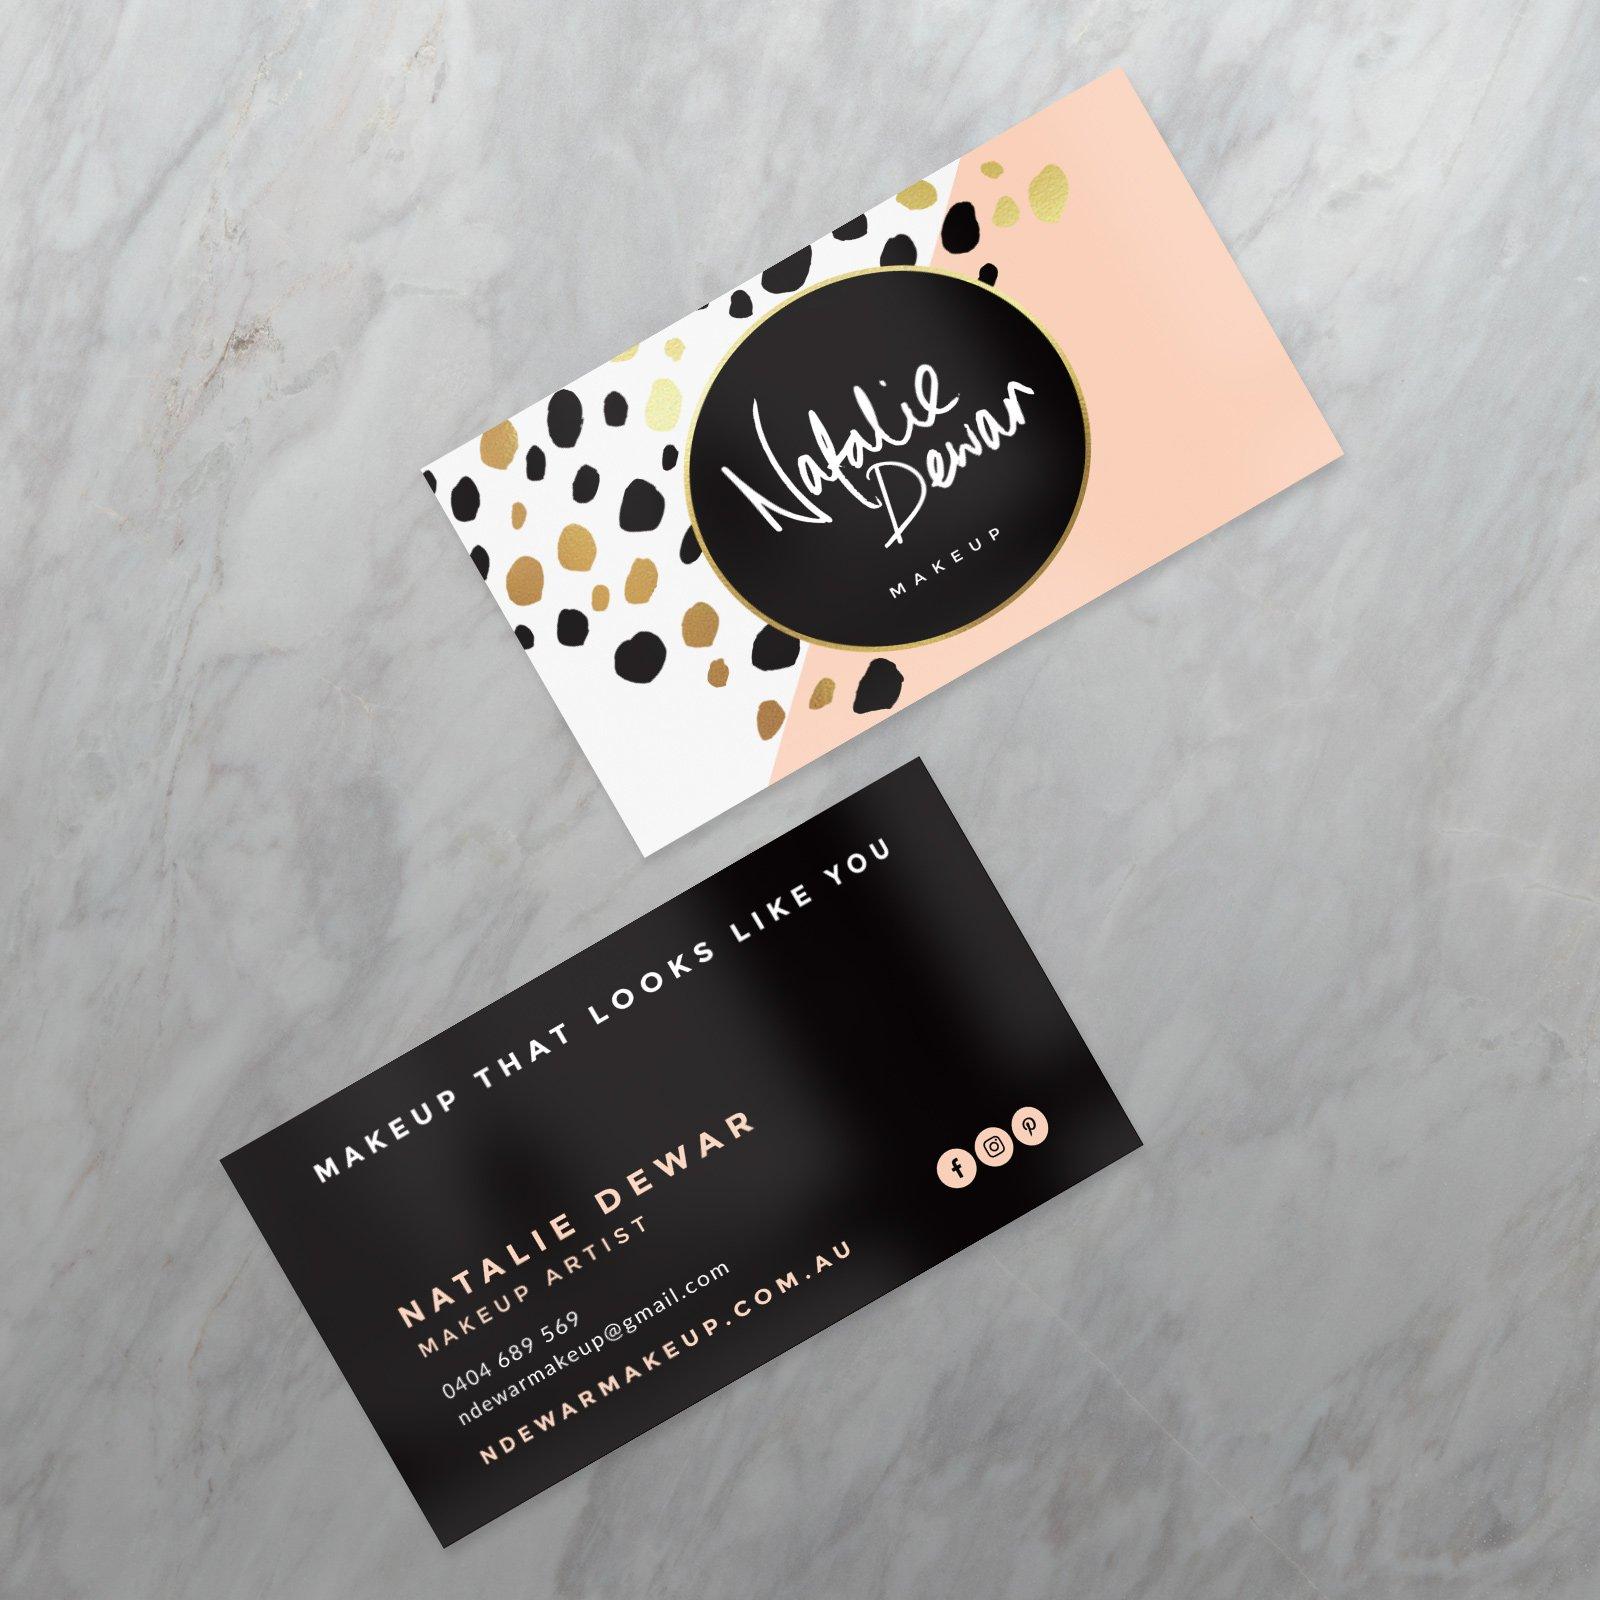 Natalie Dewar Makeup Business Card